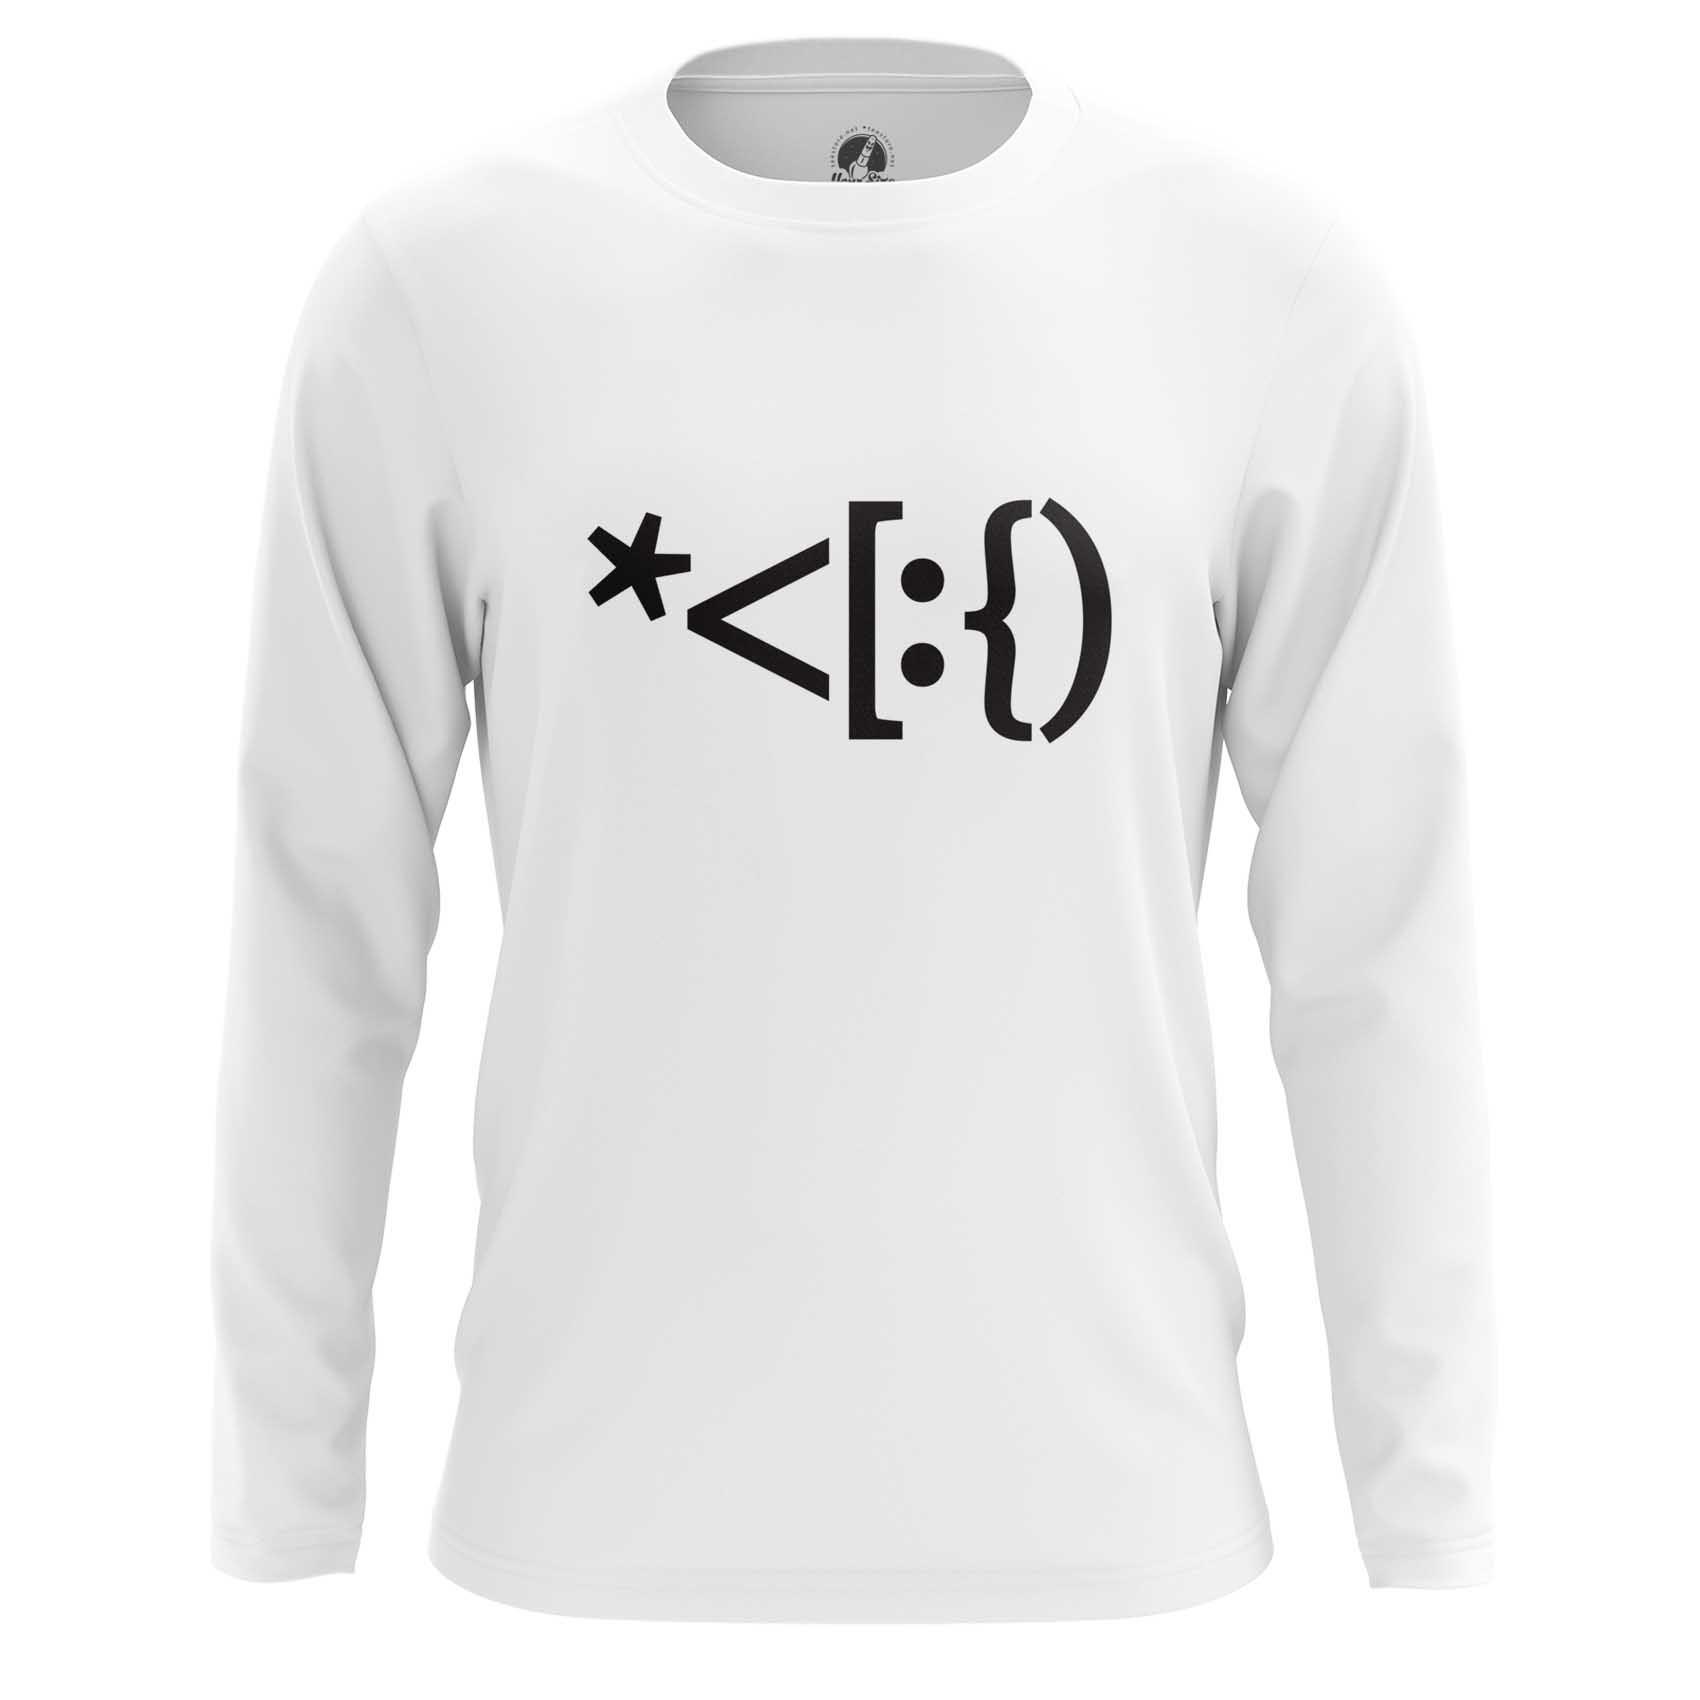 Merch Santa Christmas T-Shirt White Keybord Smile